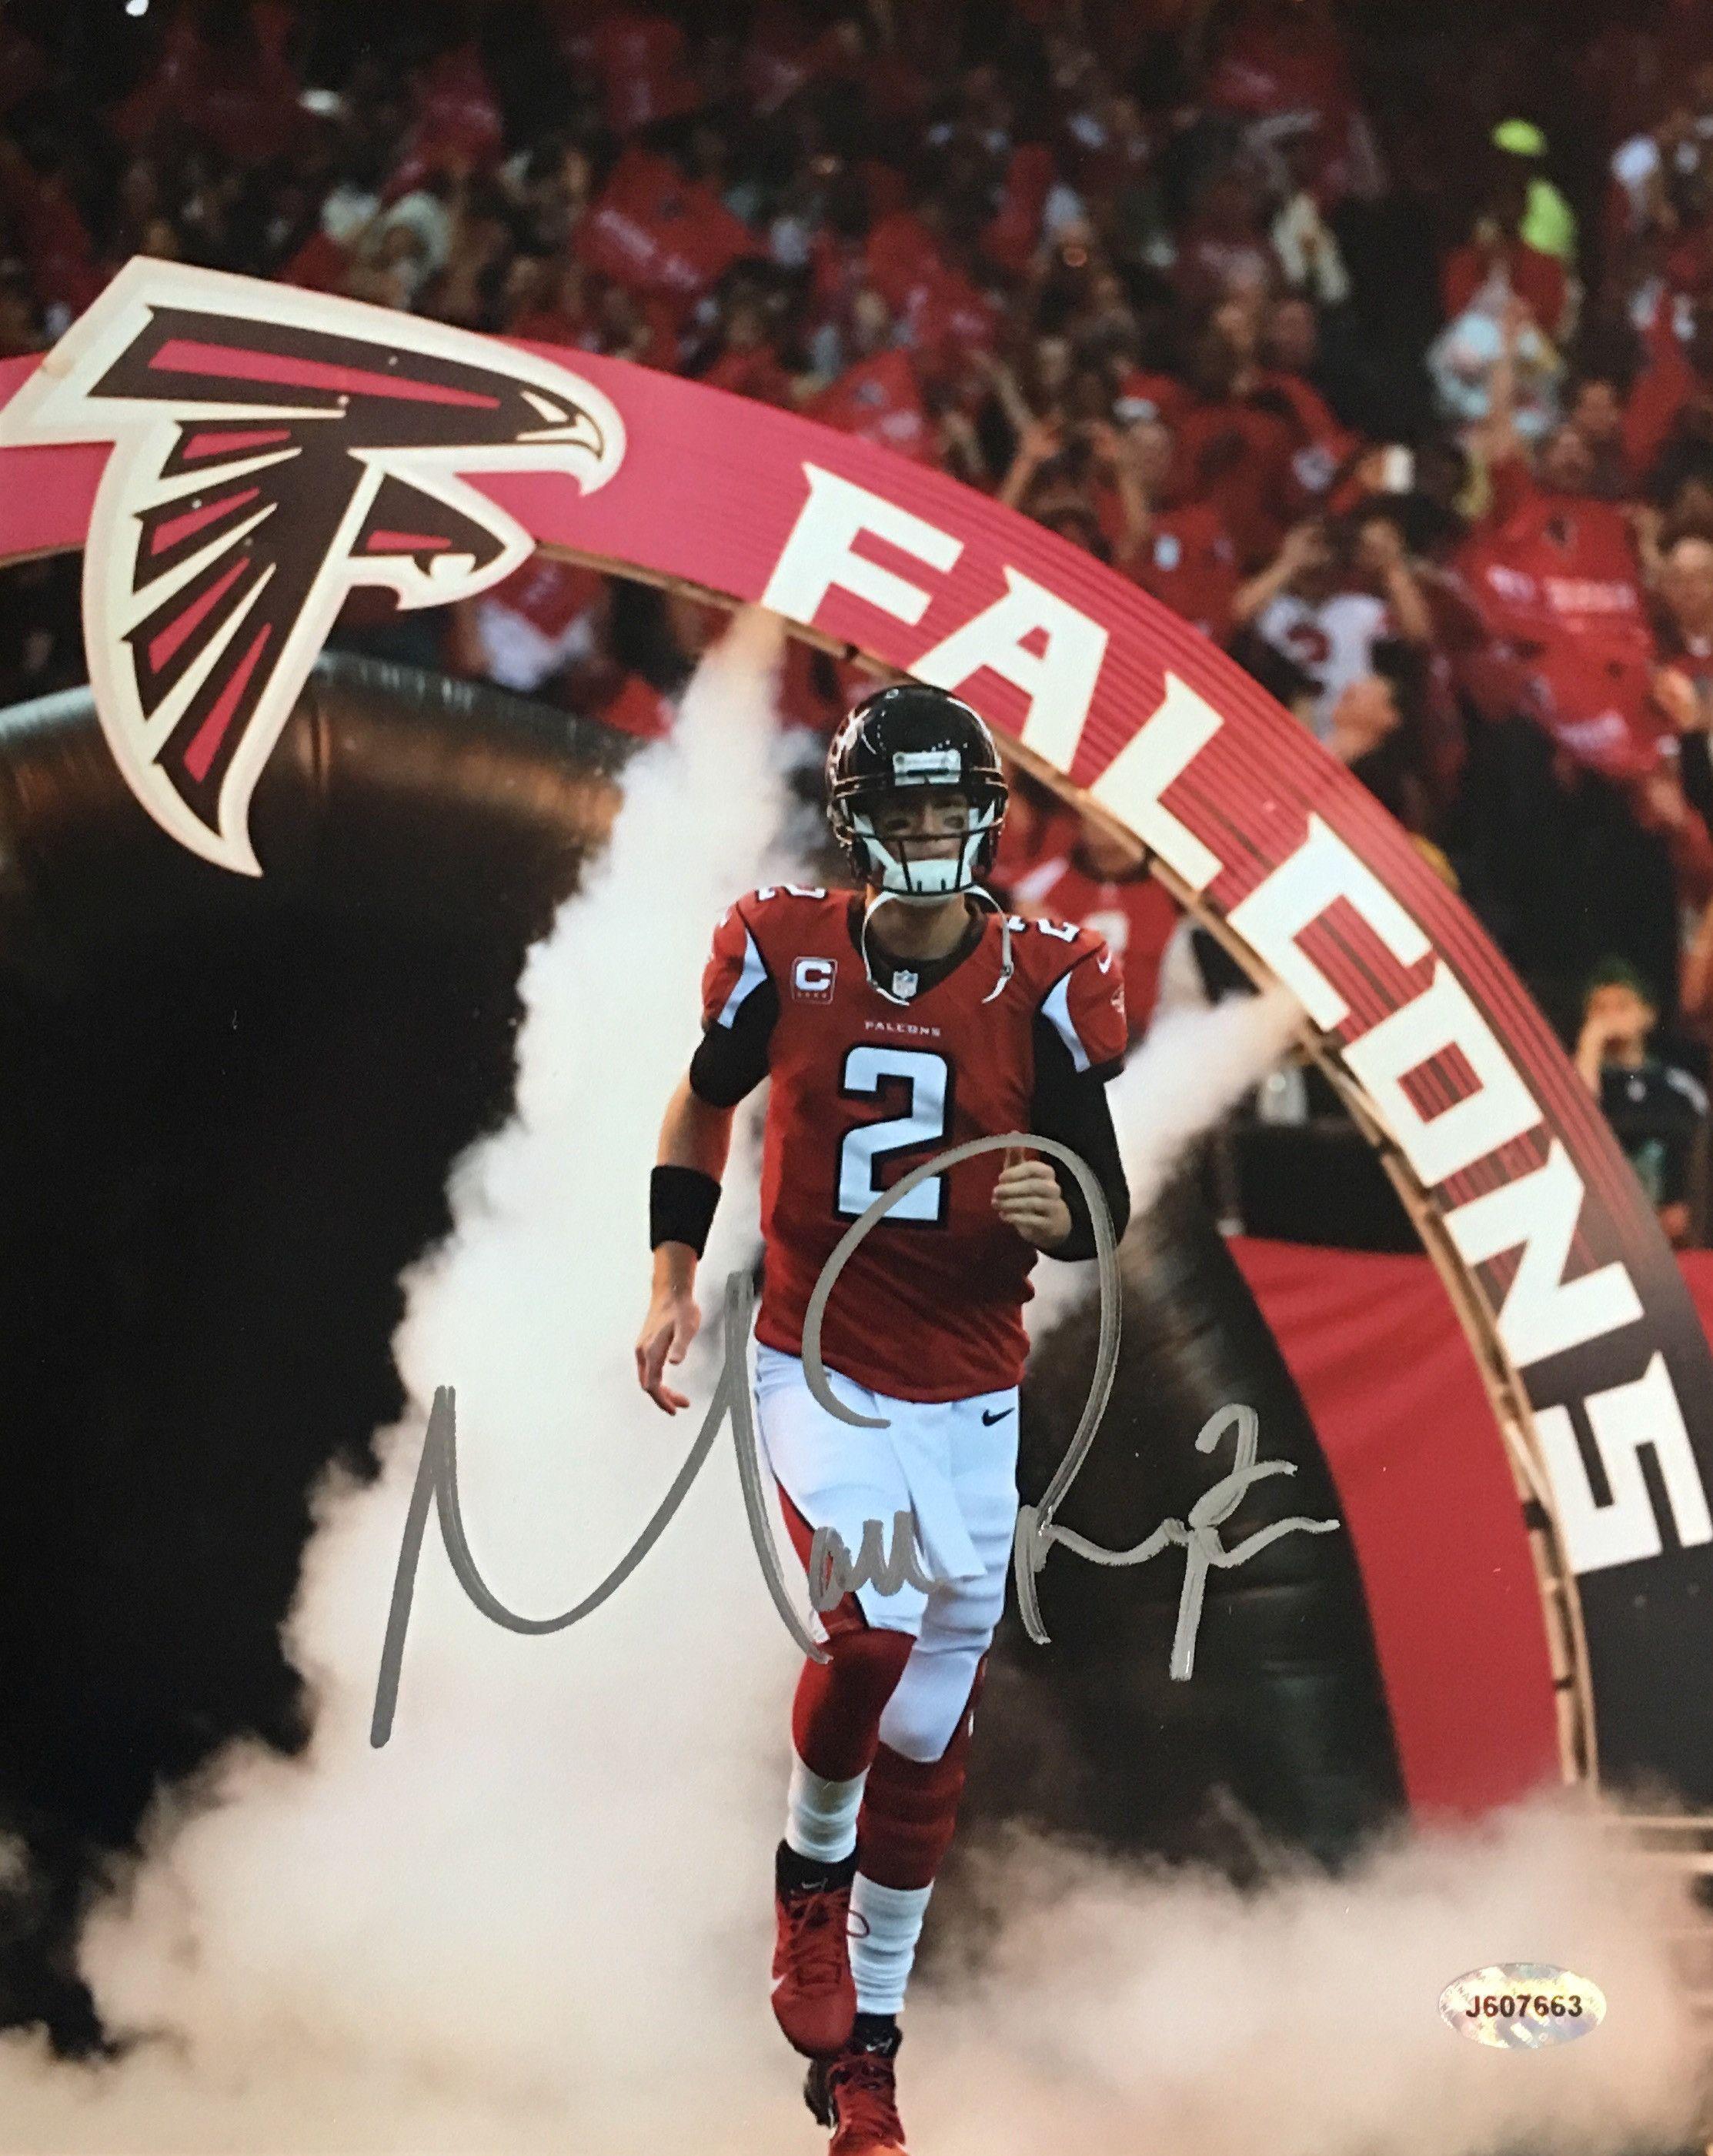 Matt Ryan Atlanta Falcons Signed 8x10 Photo Atlanta Falcons Football Atlanta Falcons Falcons Football